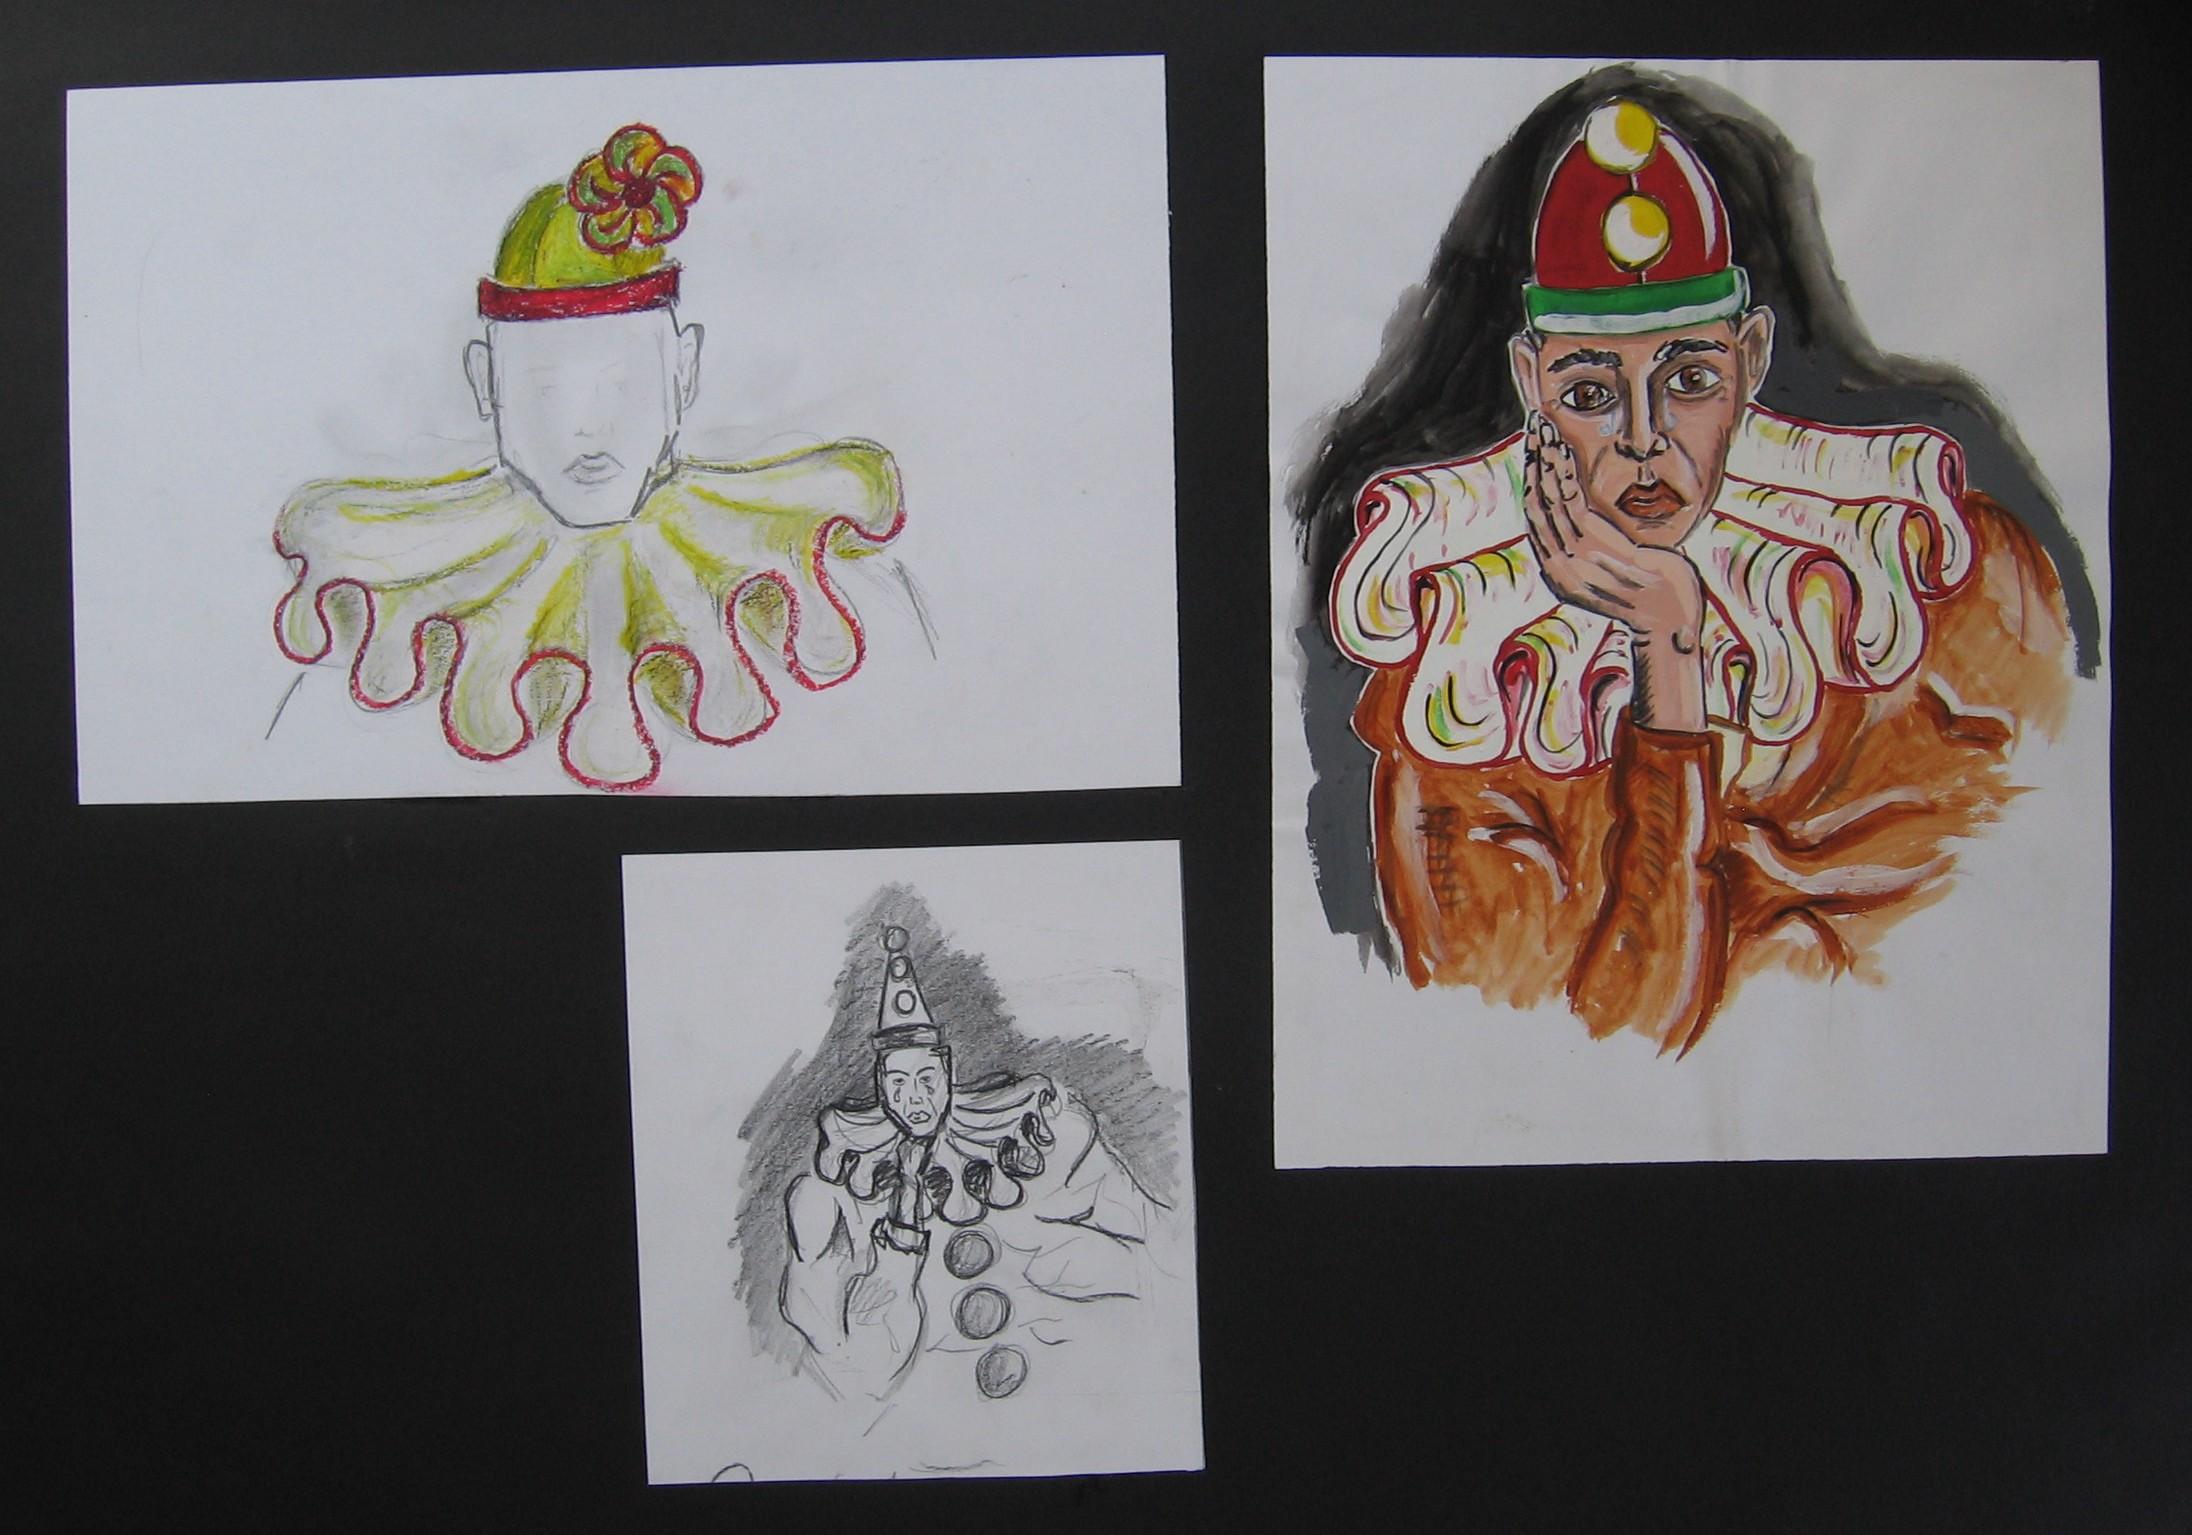 Schoolexamen schetsen 'Feest?' Vwo6